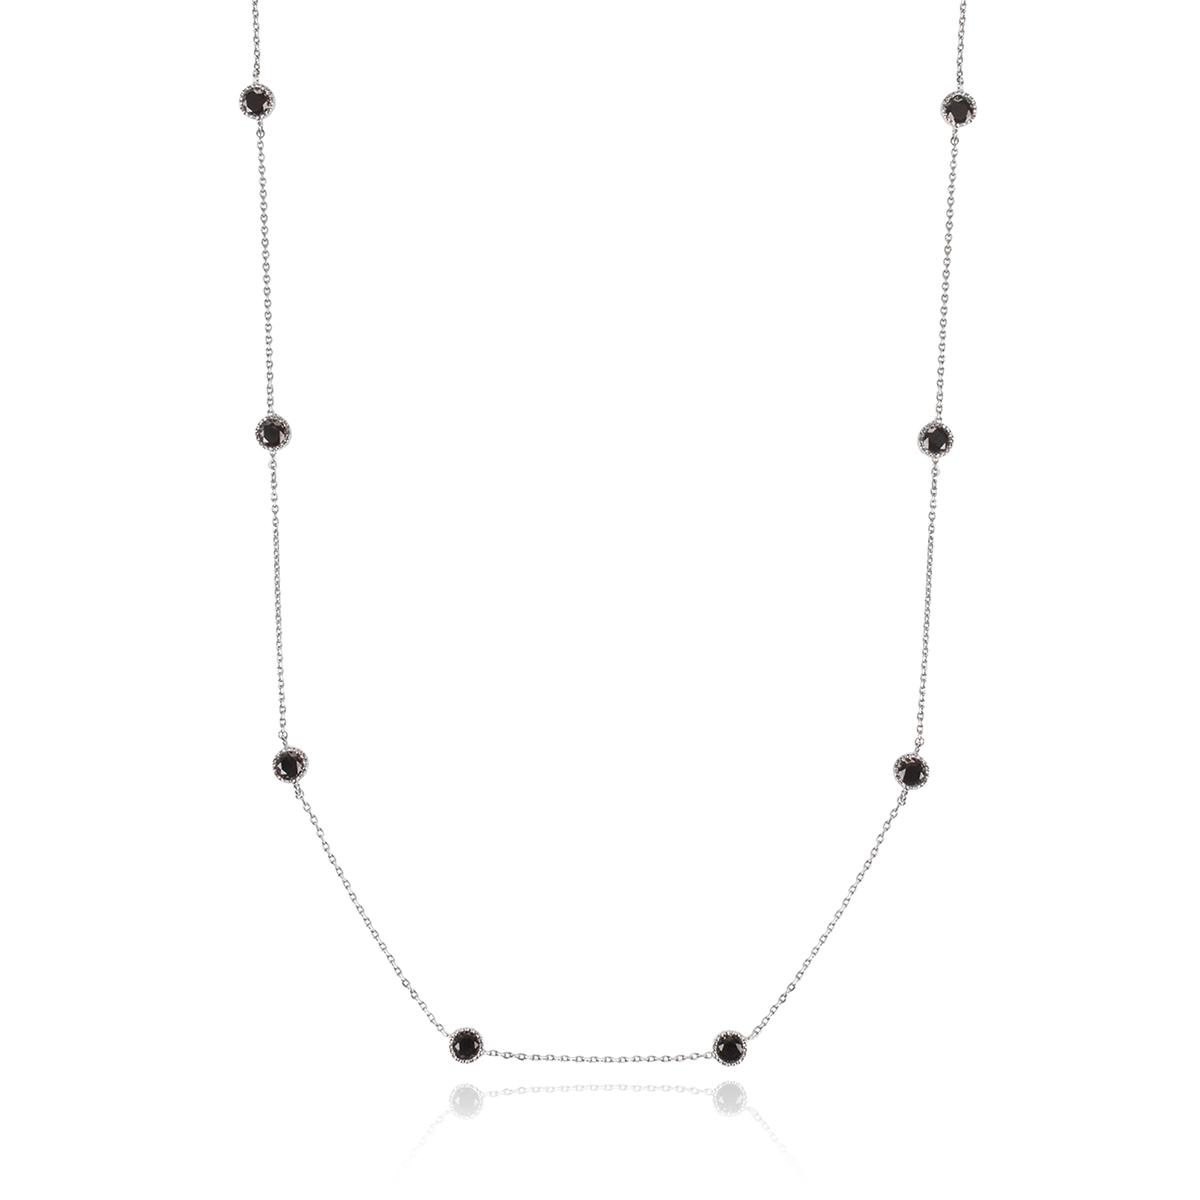 Colar Longo de Zircônia Redonda Ônix Semijoia em Ródio Branco  - SOLOYOU